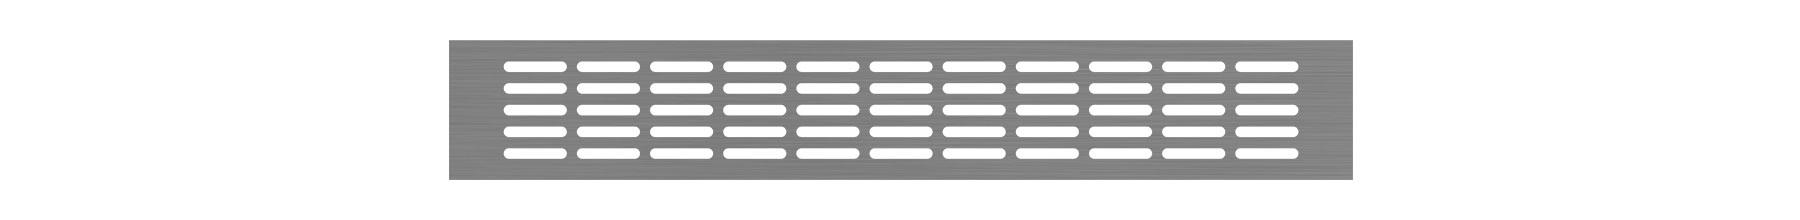 VRS-004 - Ventilaciona rešetka 66×430 mm